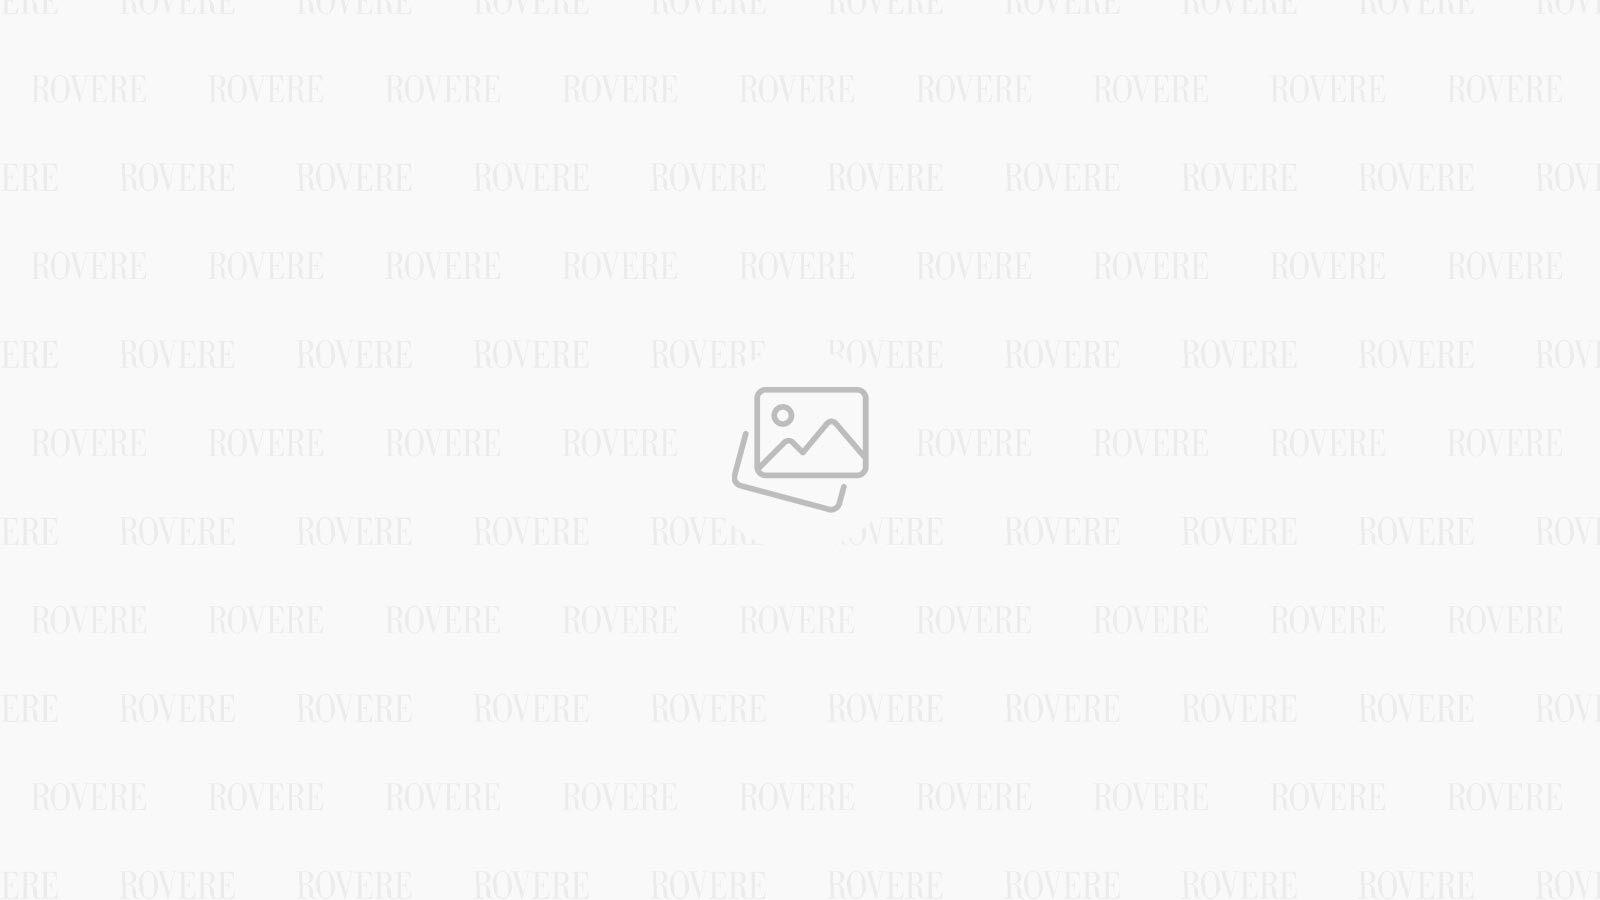 Canapea cu sezlong stanga Adrenalina textil culoarea Pewter